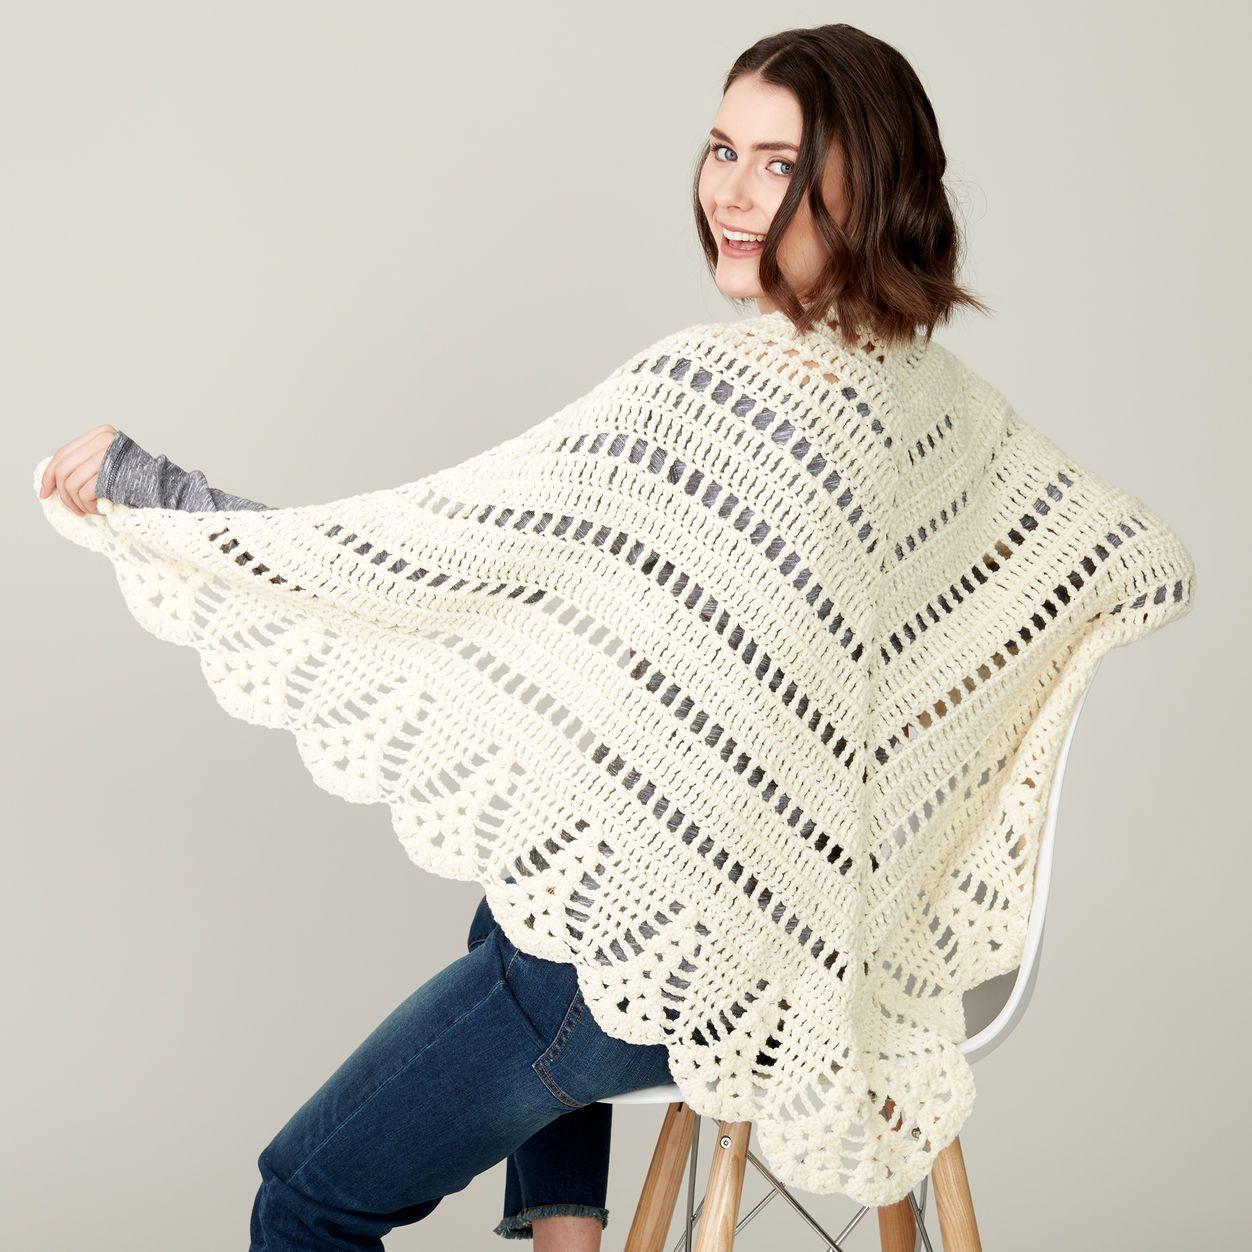 Caron Crochet Prayer Shawl | shawls | Pinterest | Chal, Ganchillo y ...